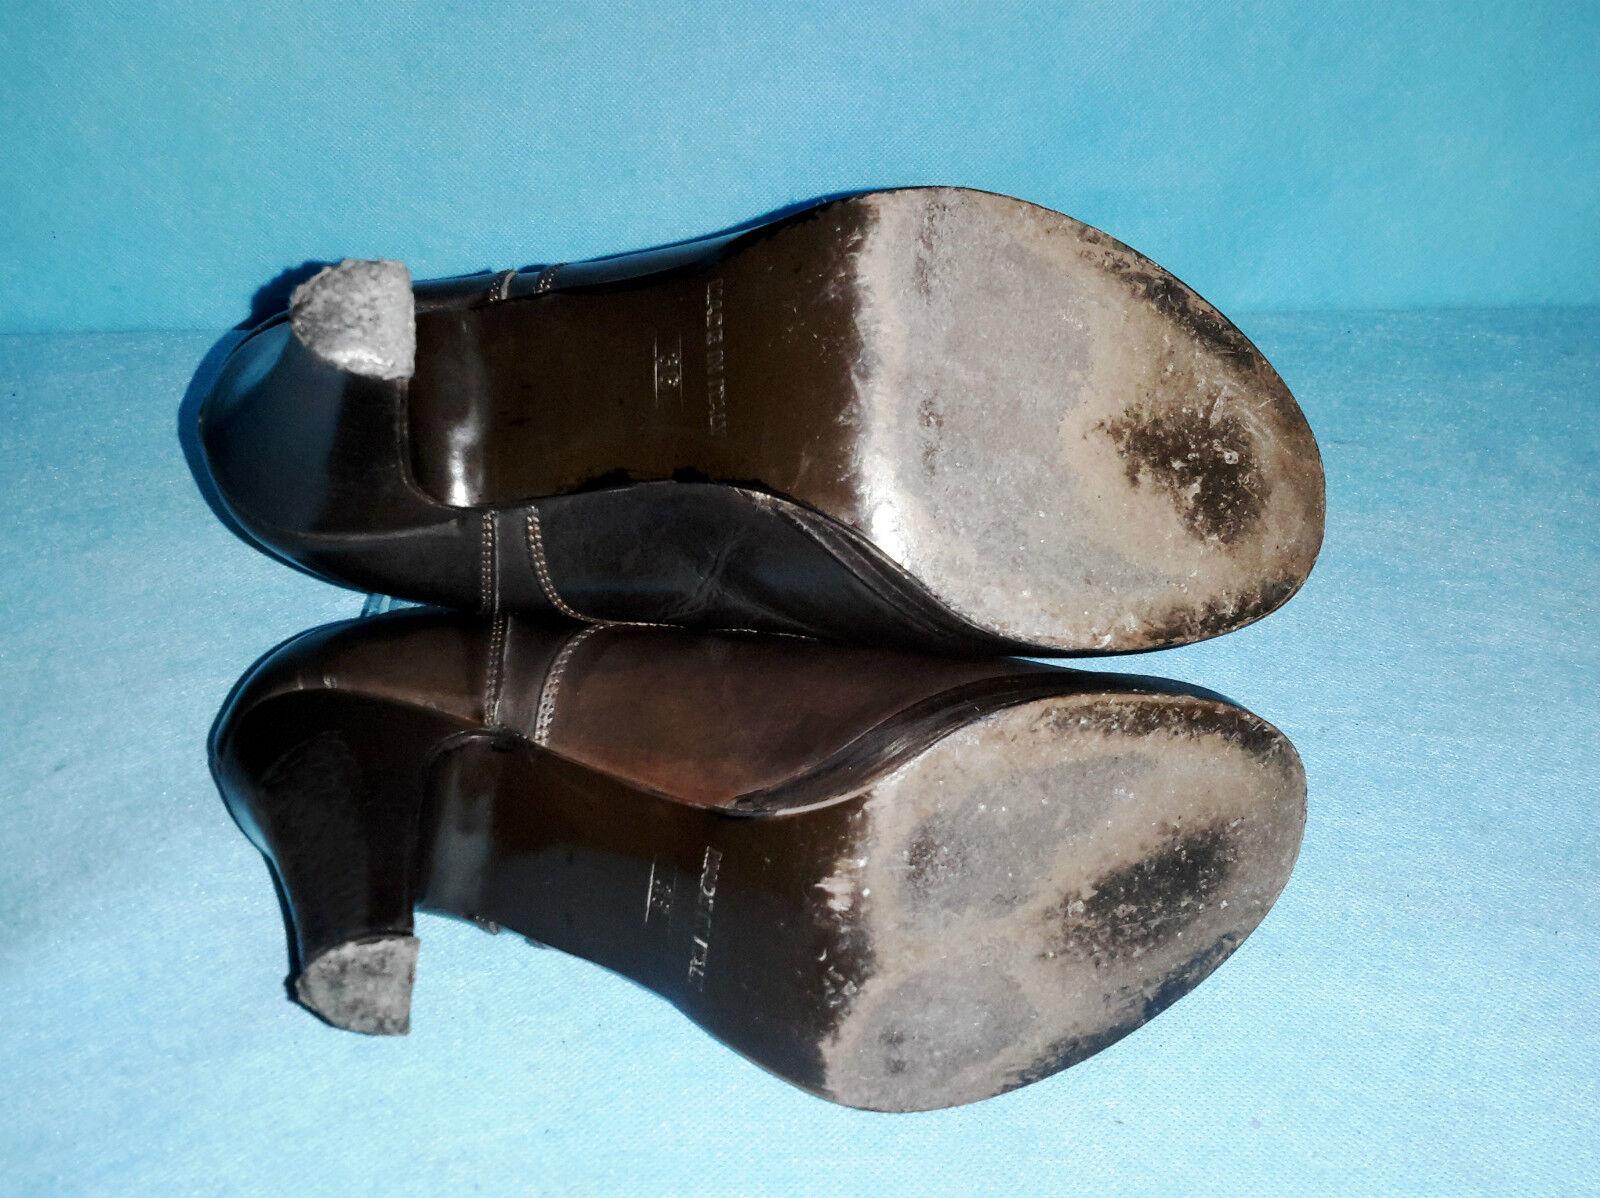 Derby Stiefel LIU JO en cuir tres  p 36 fr tres cuir bon etat 0945b4